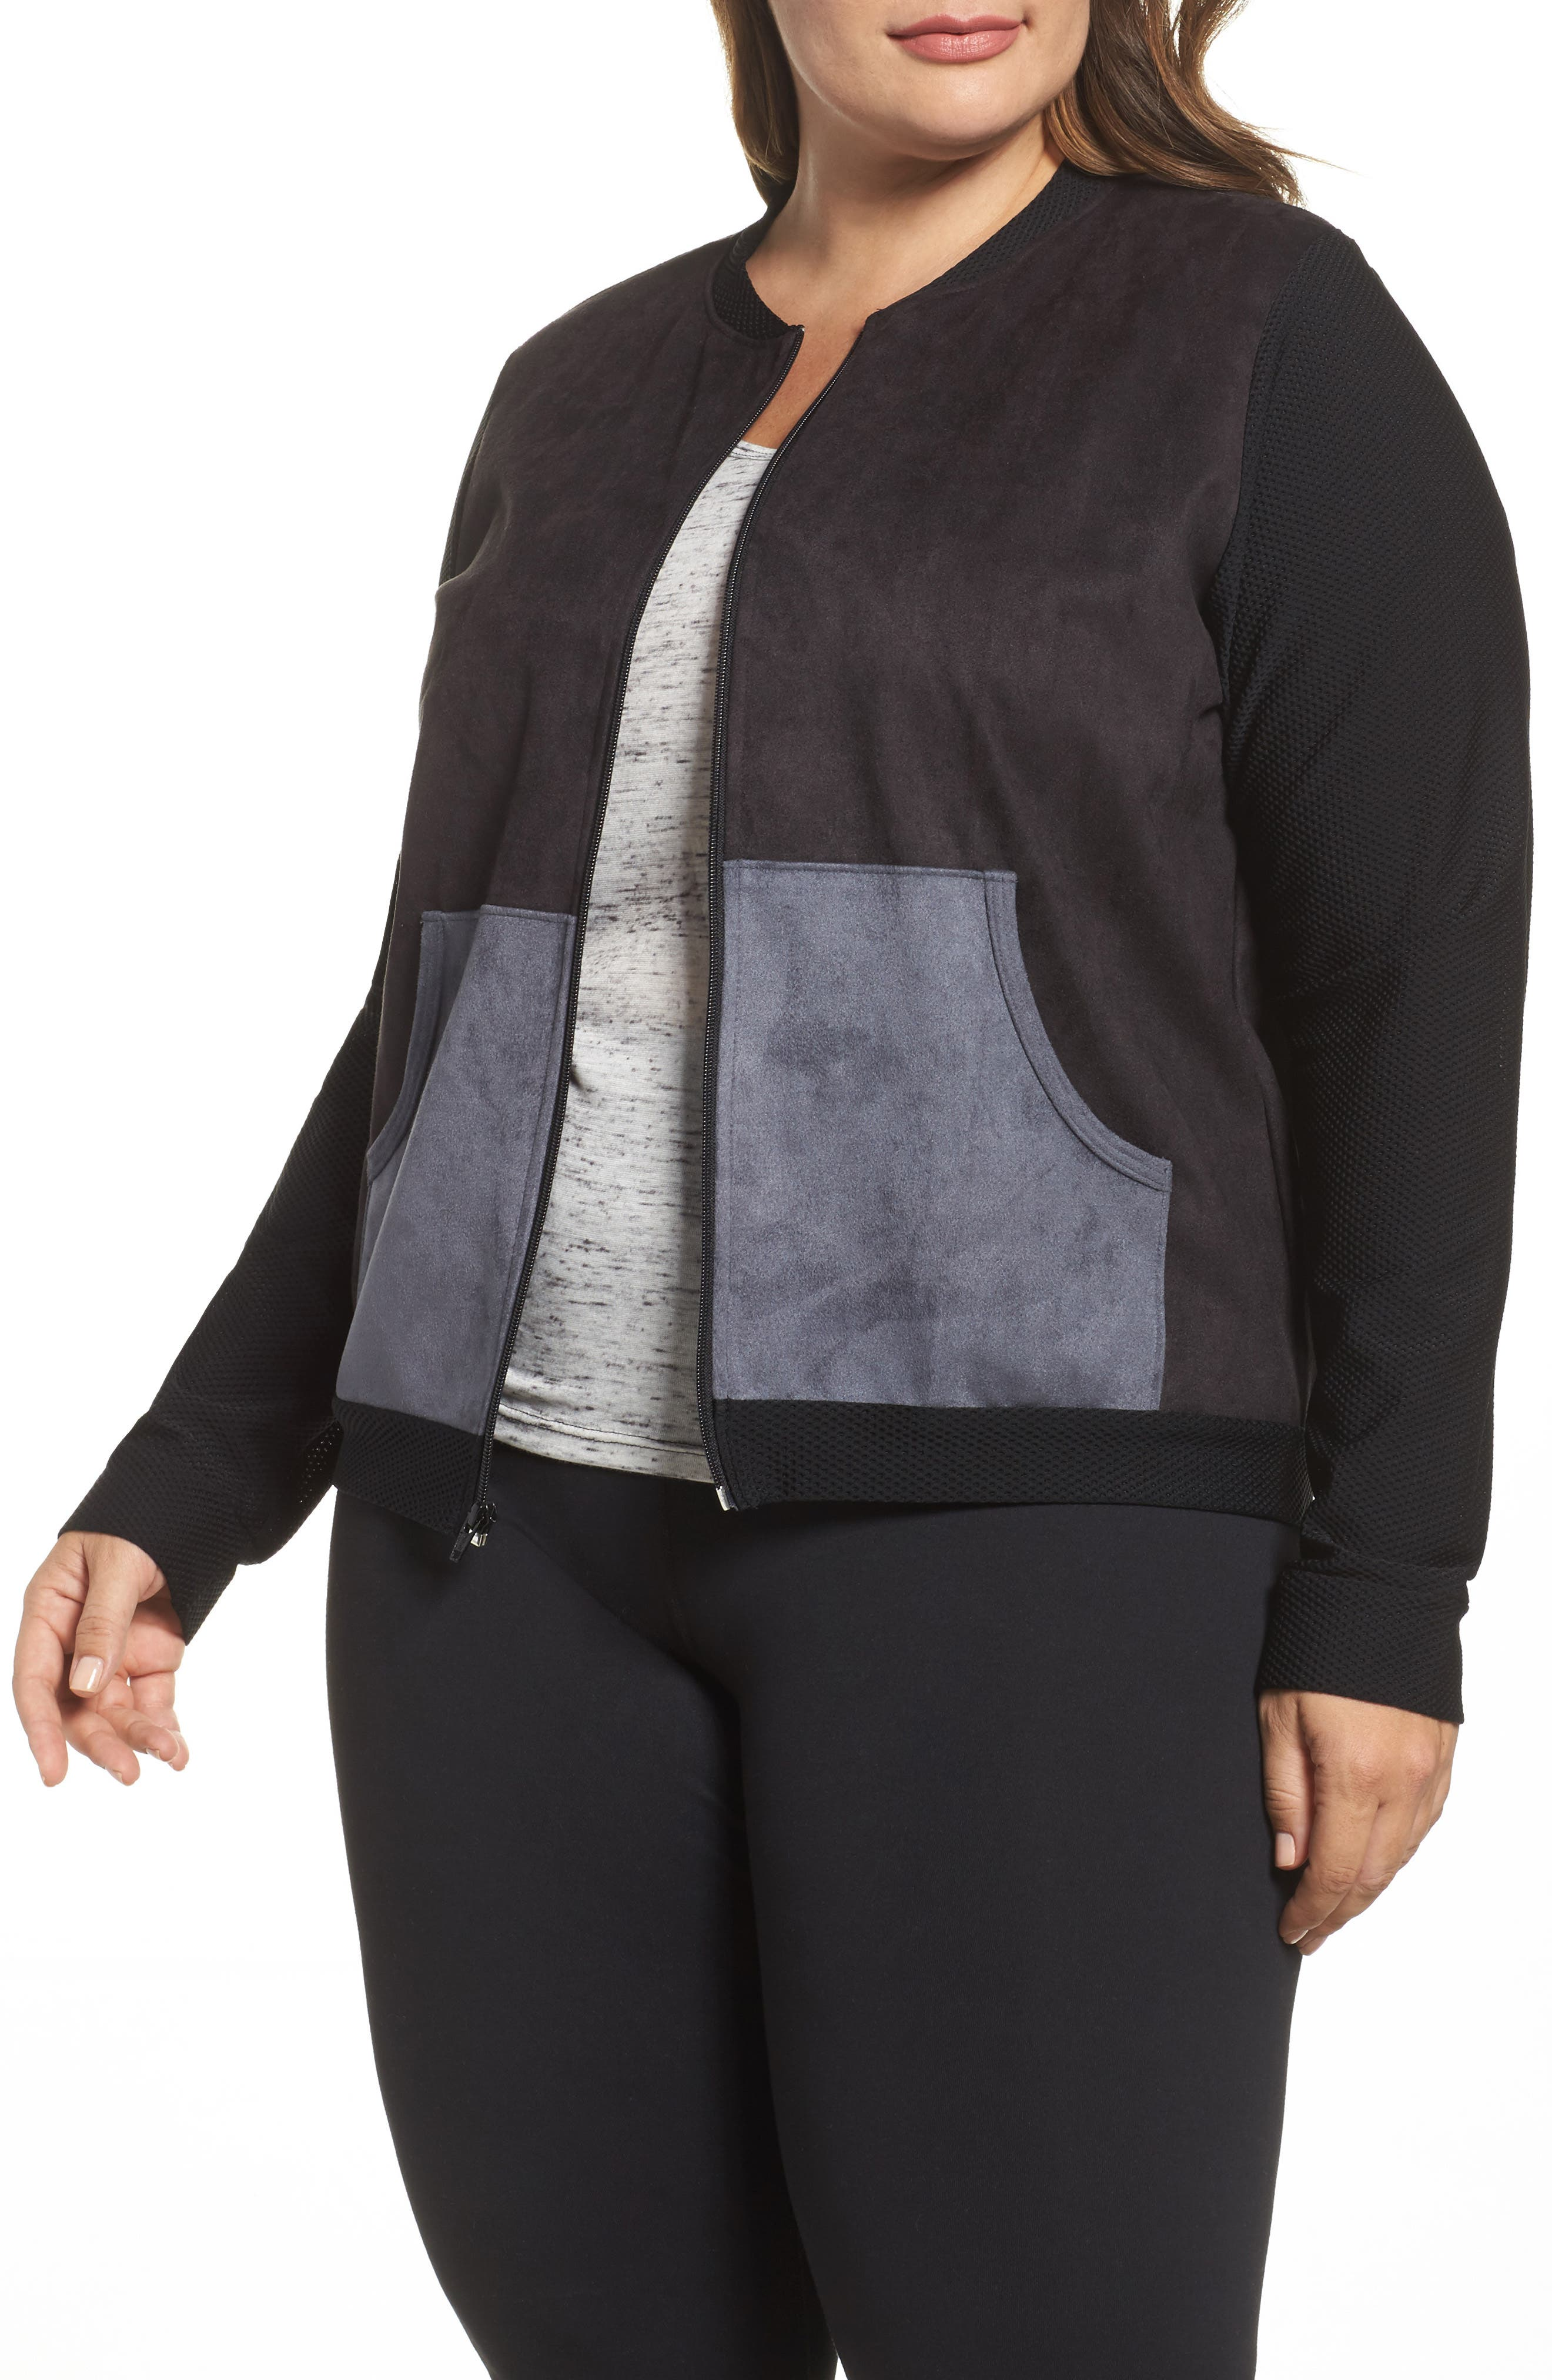 Track Jacket,                             Main thumbnail 1, color,                             Black/ Charcoal